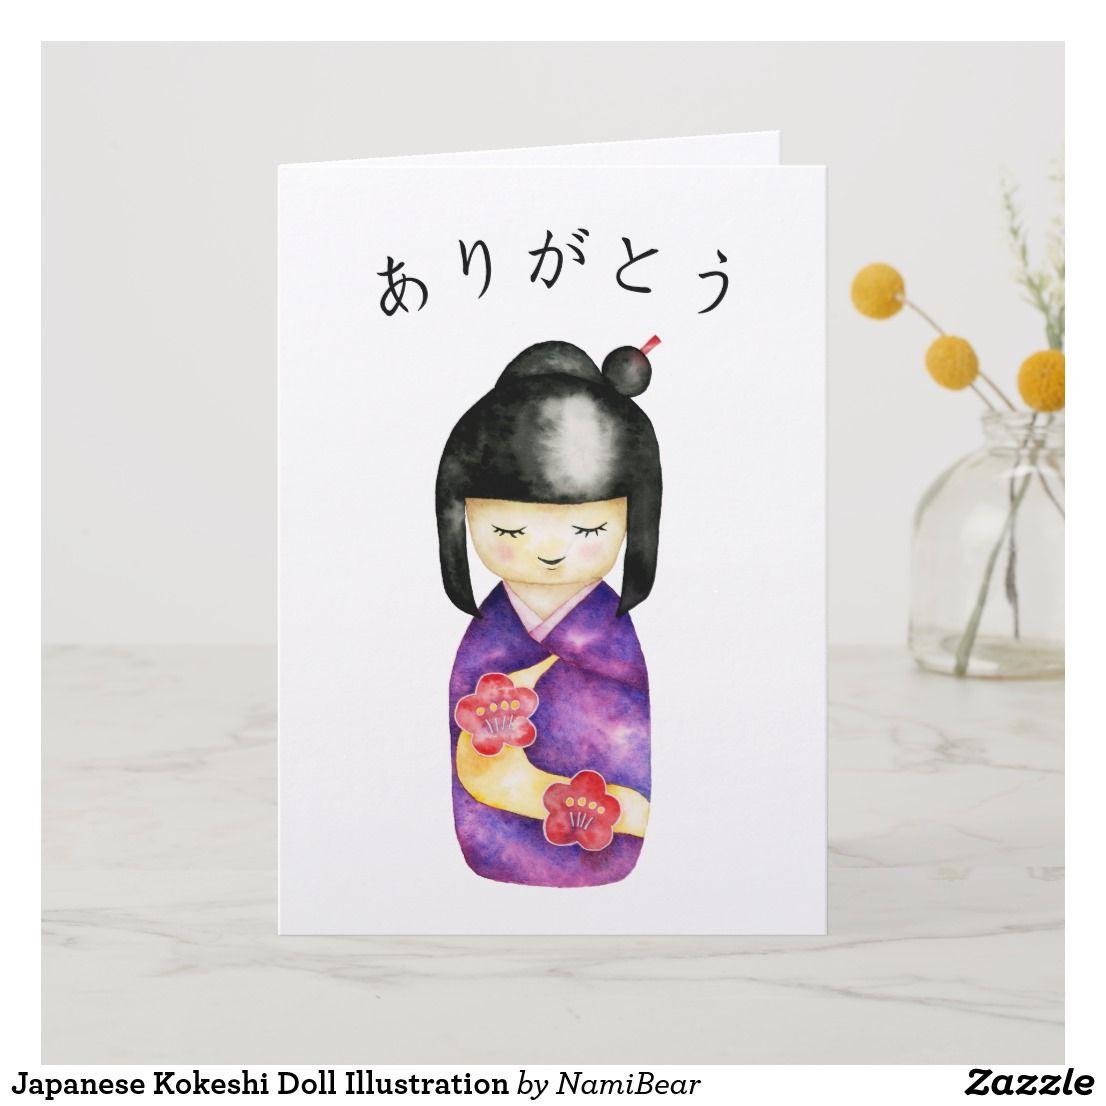 Japanese Kokeshi Doll Thank You Card Zazzle Com Funeral Thank You Cards Kokeshi Dolls Cards